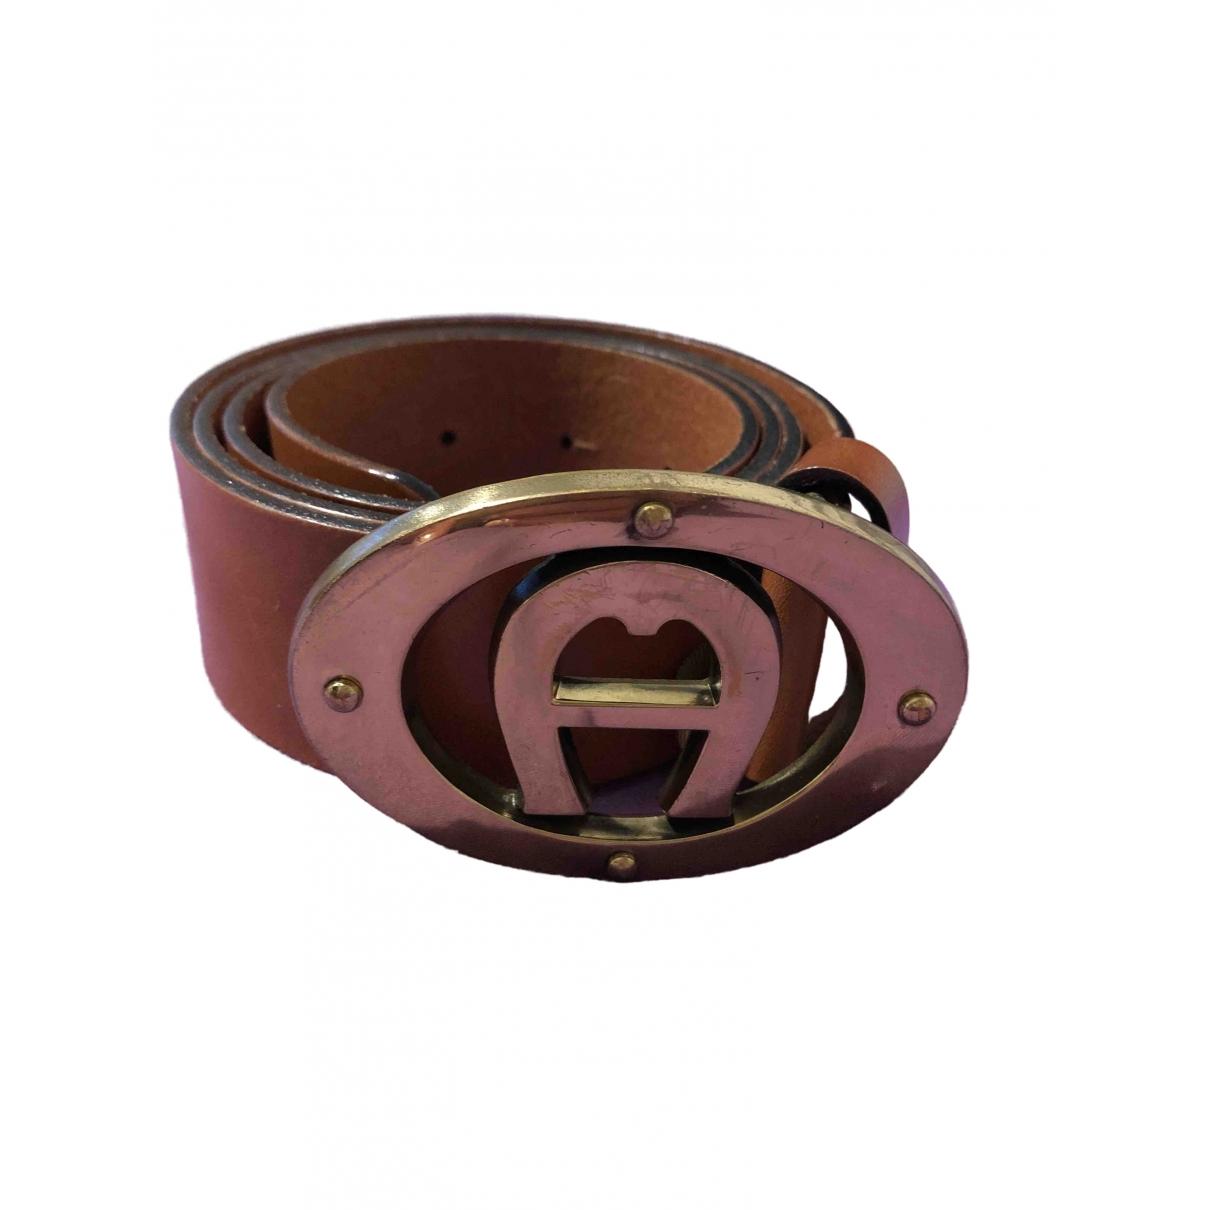 Etienne Aigner \N Brown Leather belt for Women S International